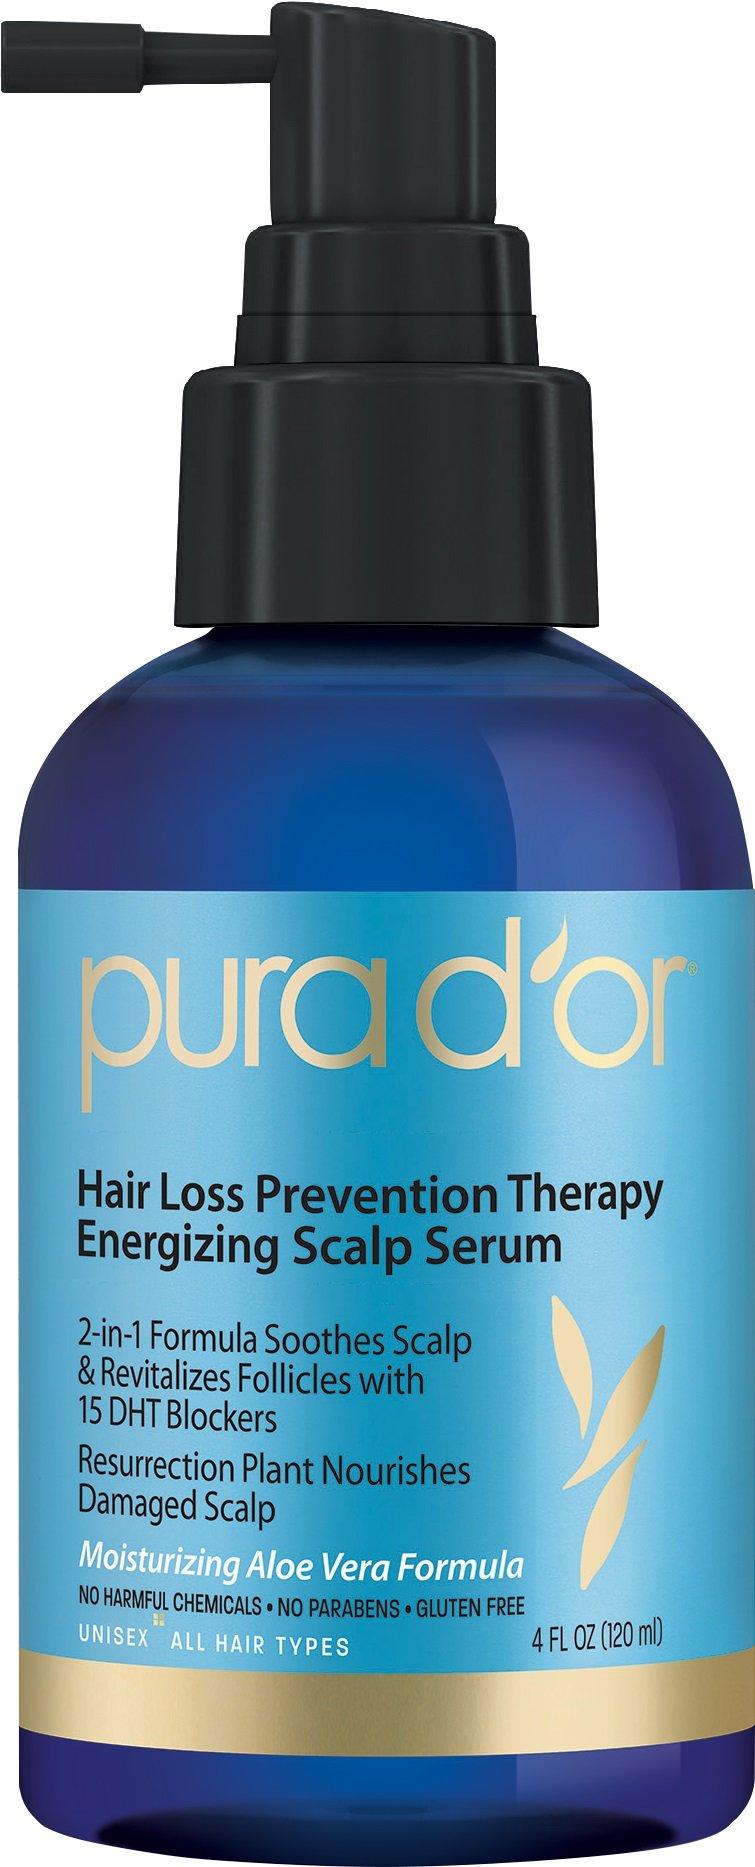 PURA D'OR Hair Loss Prevention Therapy Energizing Scalp Serum Hair Revitalizer Organic Argan Oil & Biotin, 4 Fluid Ounce